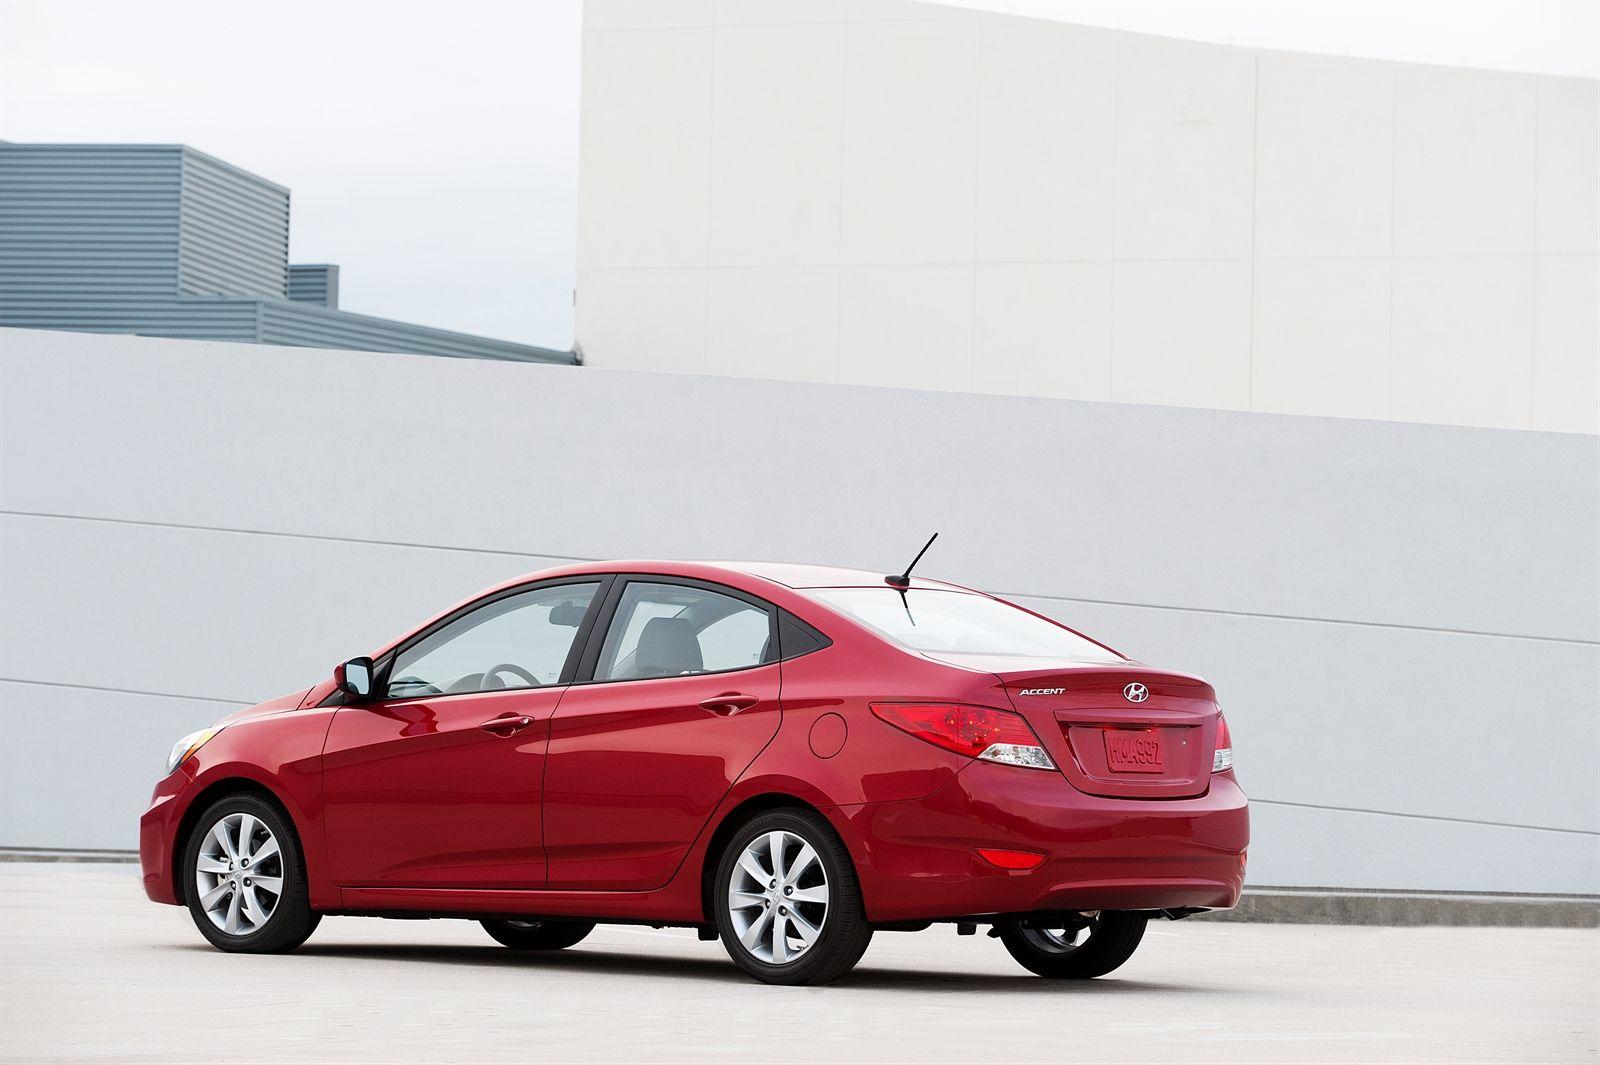 HYUNDAI Accent 4 Doors Hyundai accent, Nissan versa, Hyundai